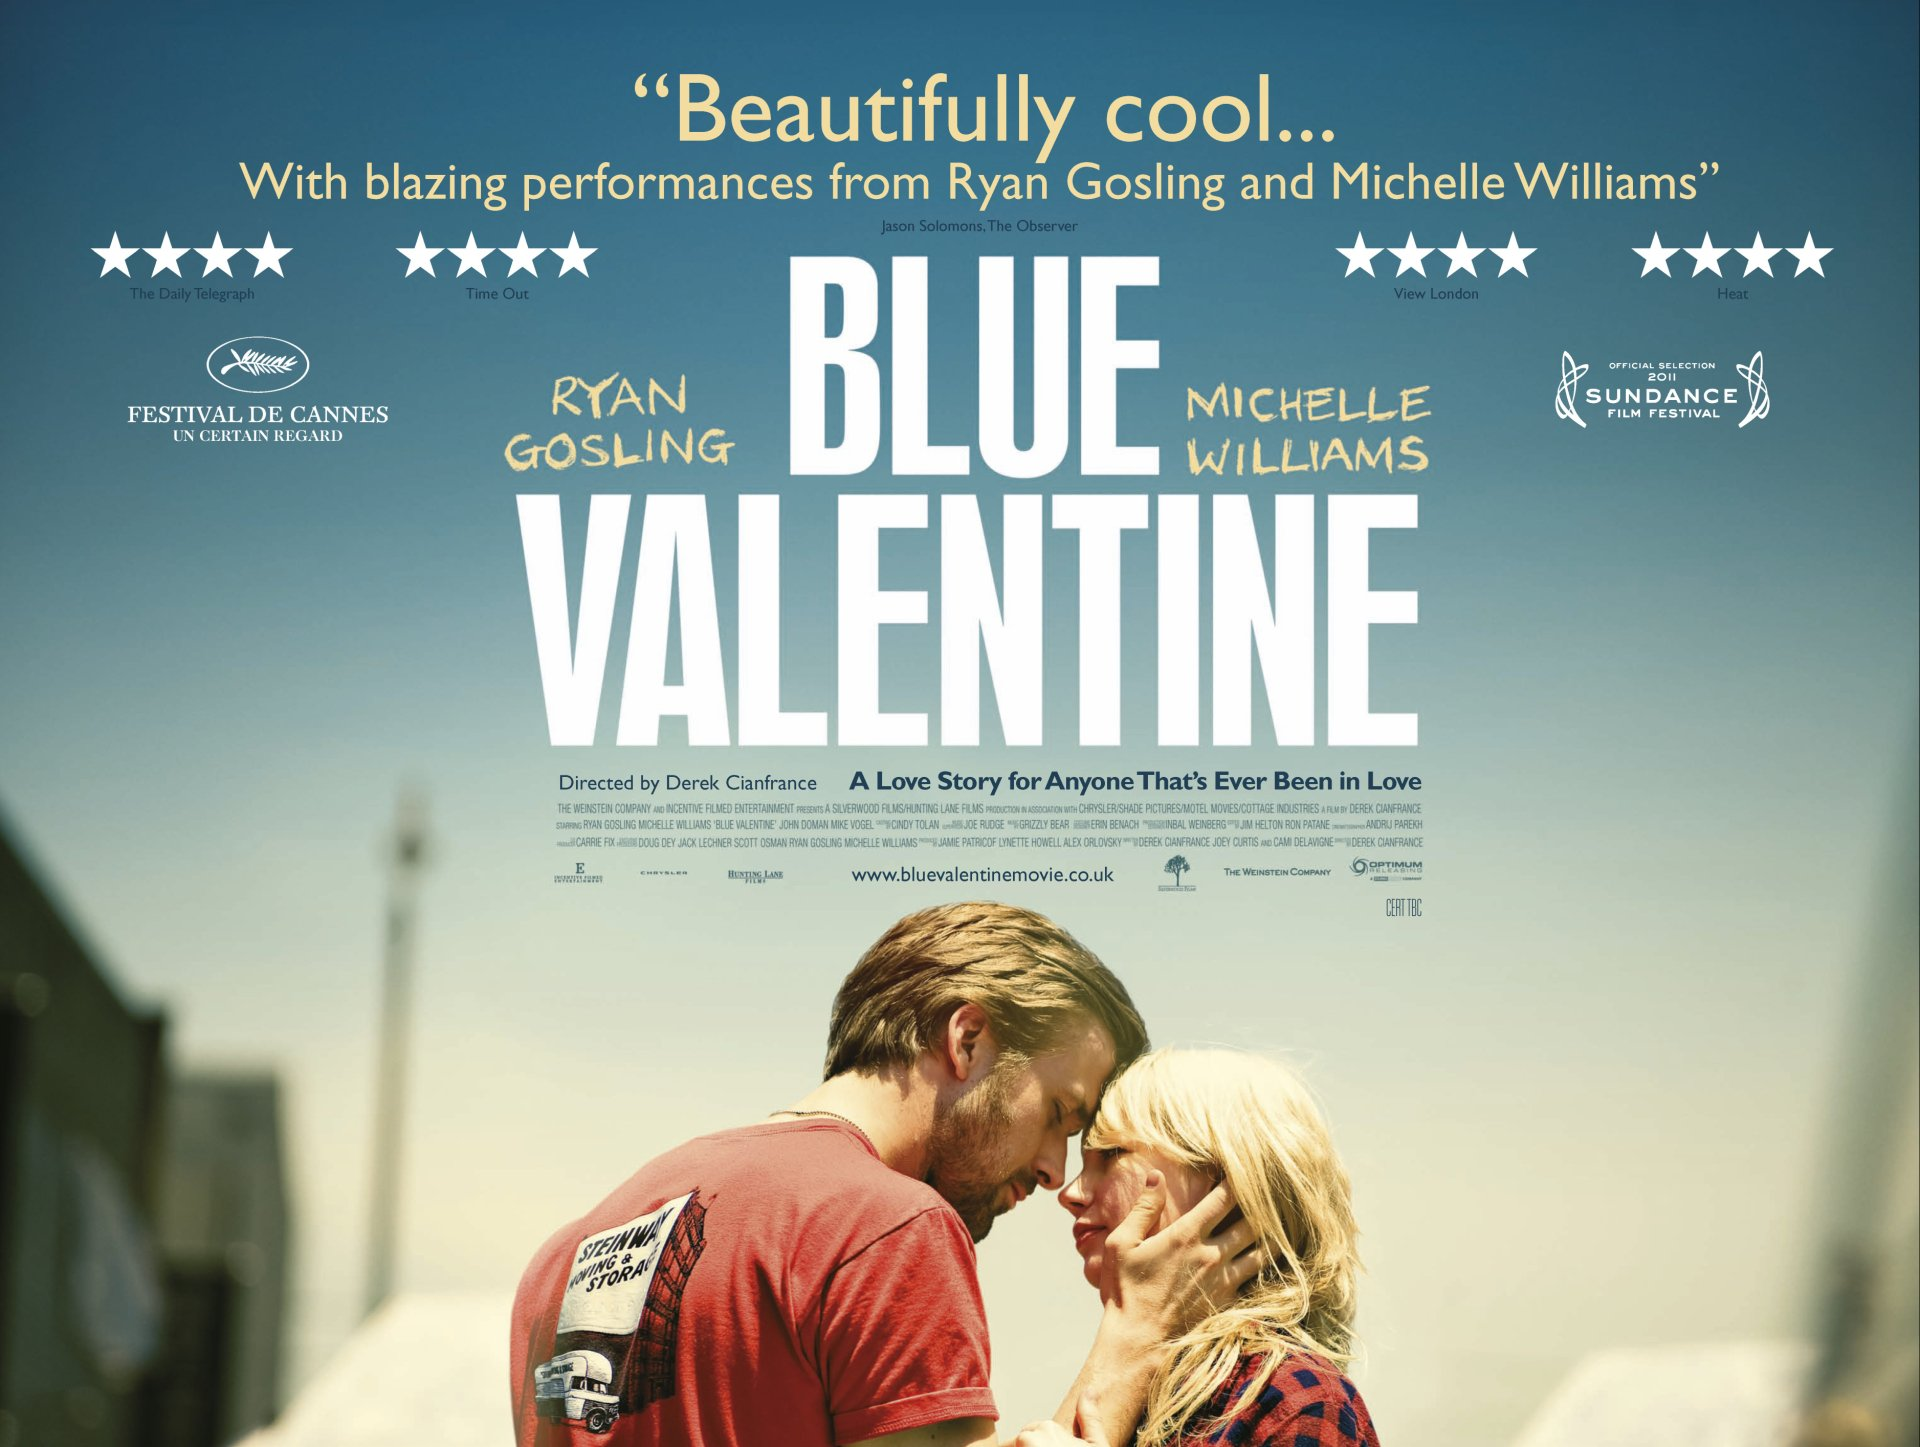 2 Blue Valentine Fondos De Pantalla Hd Fondos De